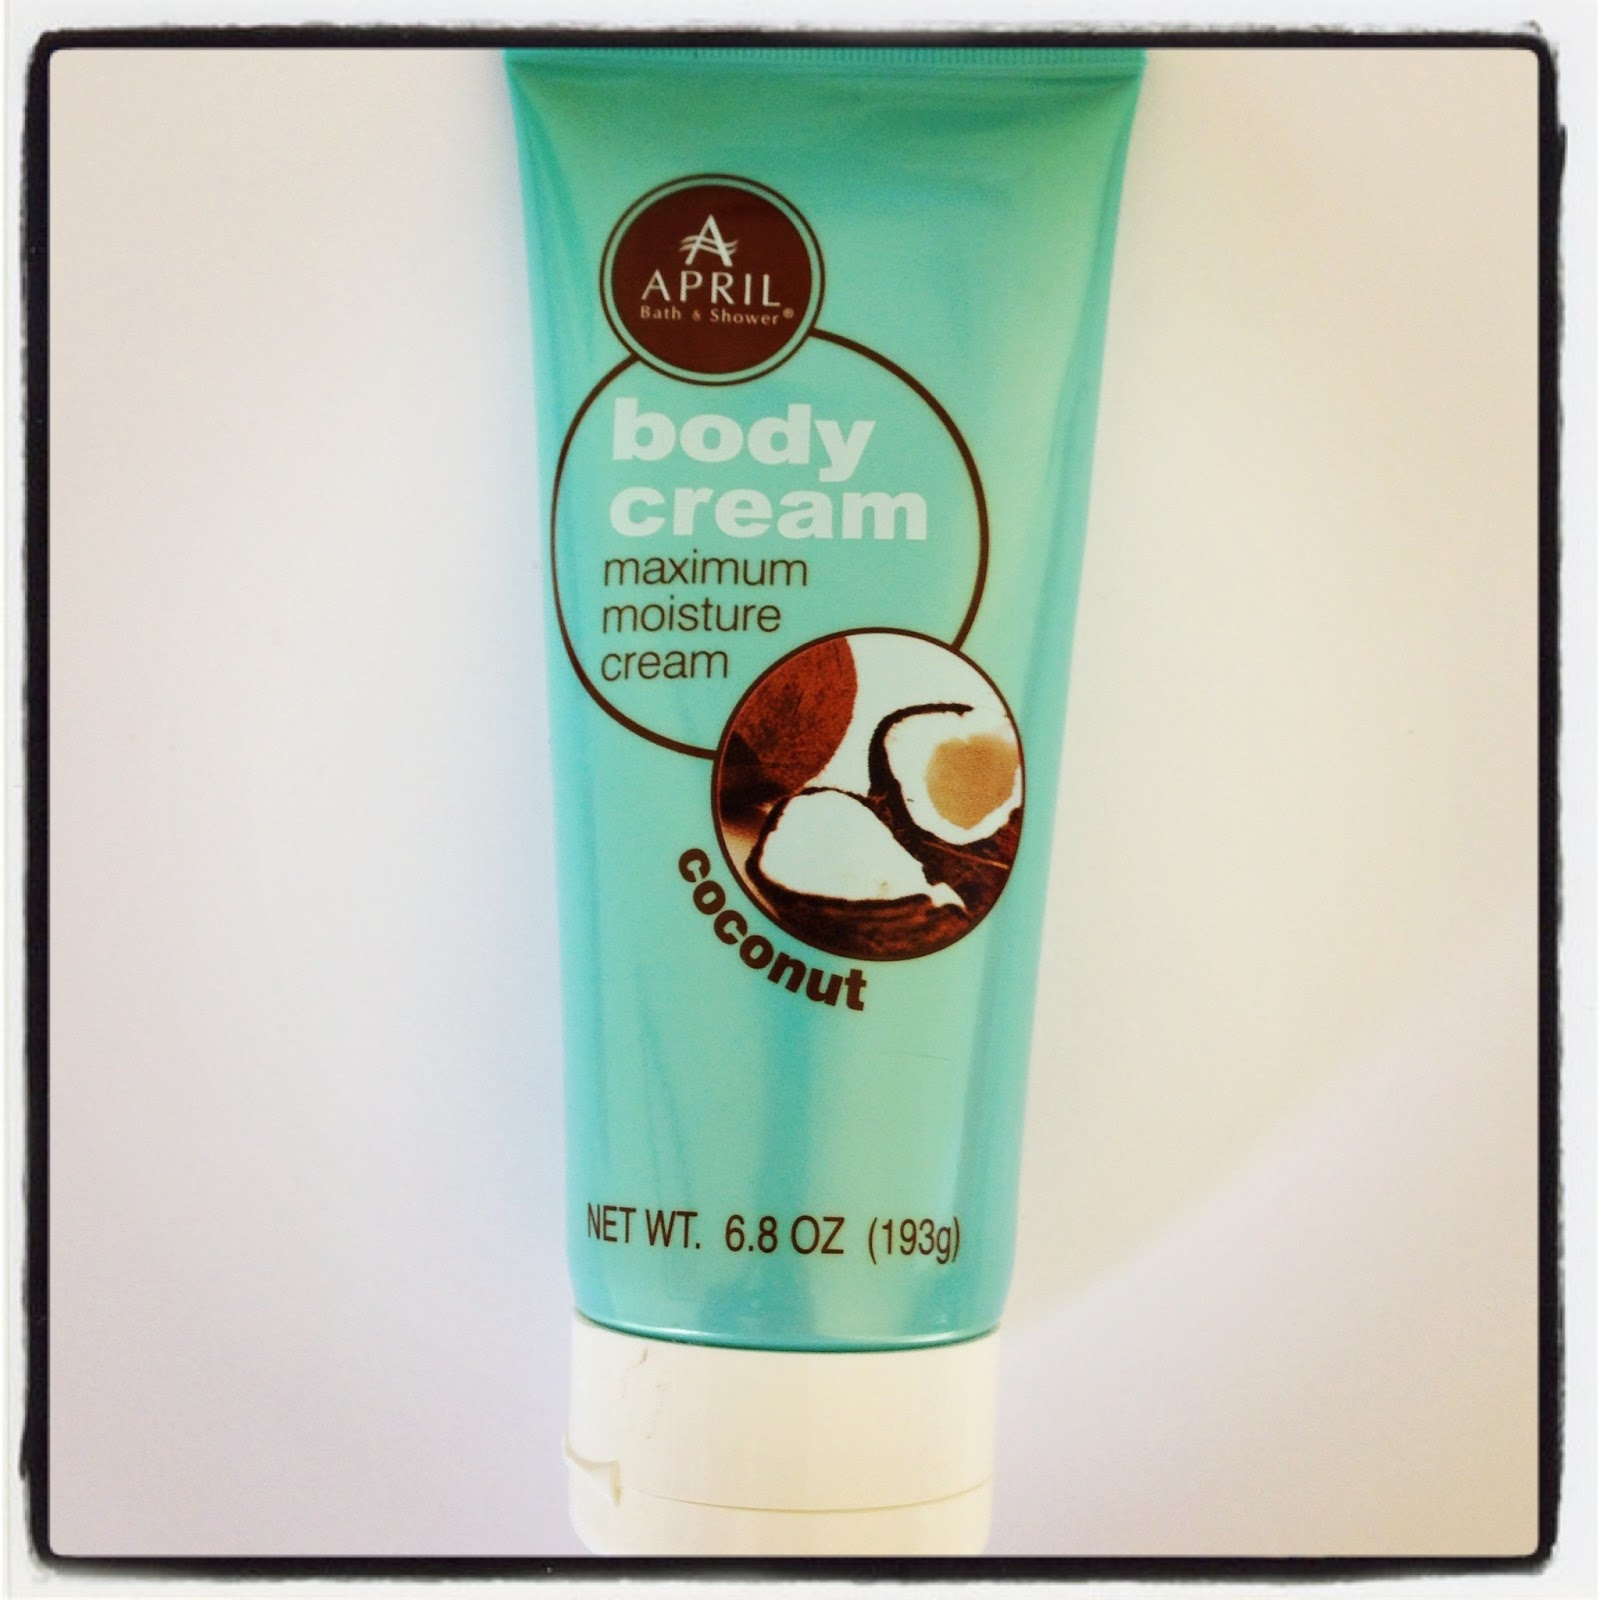 April Bath And Shower samantha chic: fresh finds: april bath & shower body cream coconut